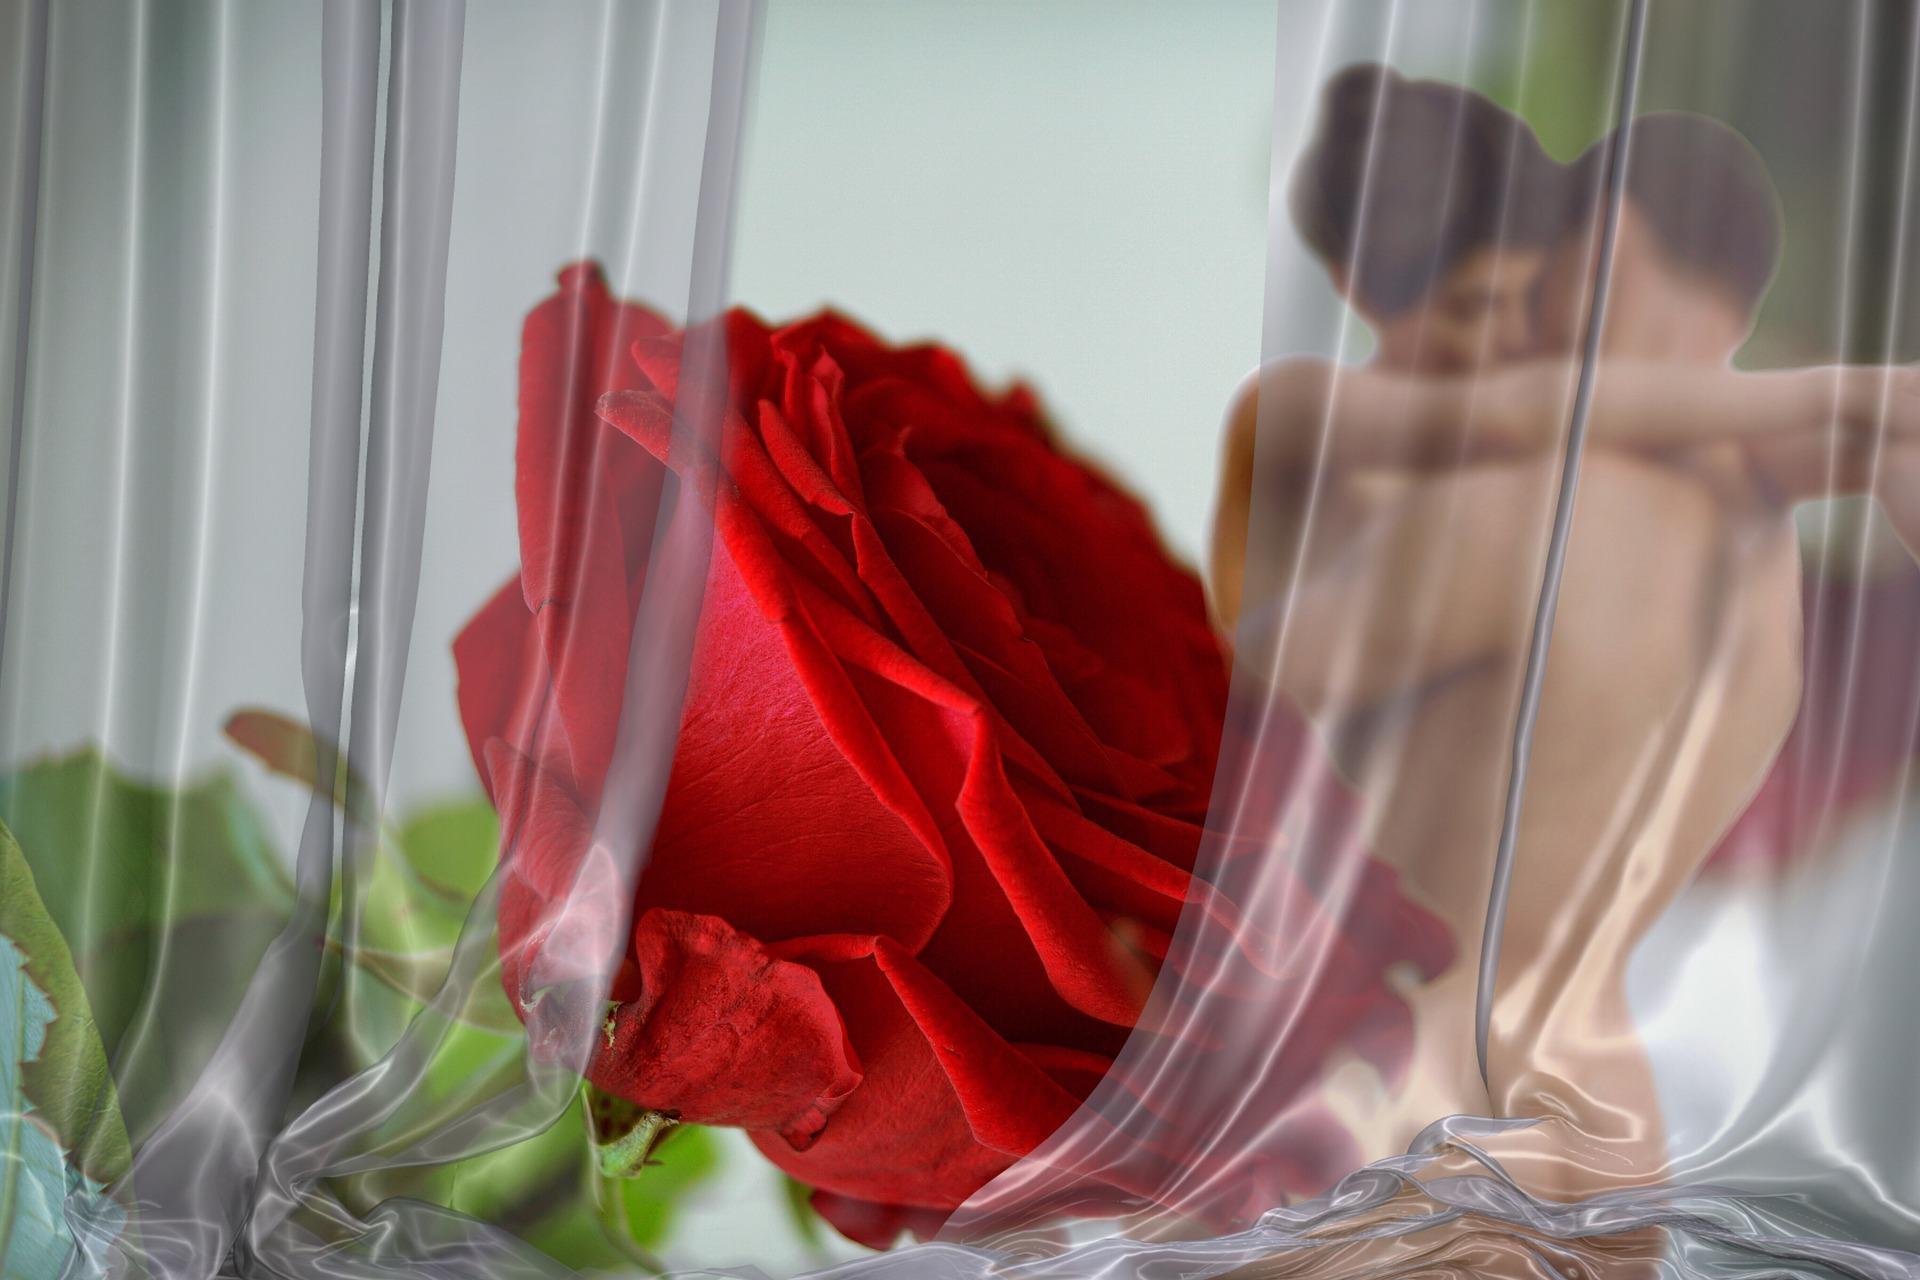 Cele mai frecvente cauze ale disfunctiei erectile - Farmacia Ta - Farmacia Ta